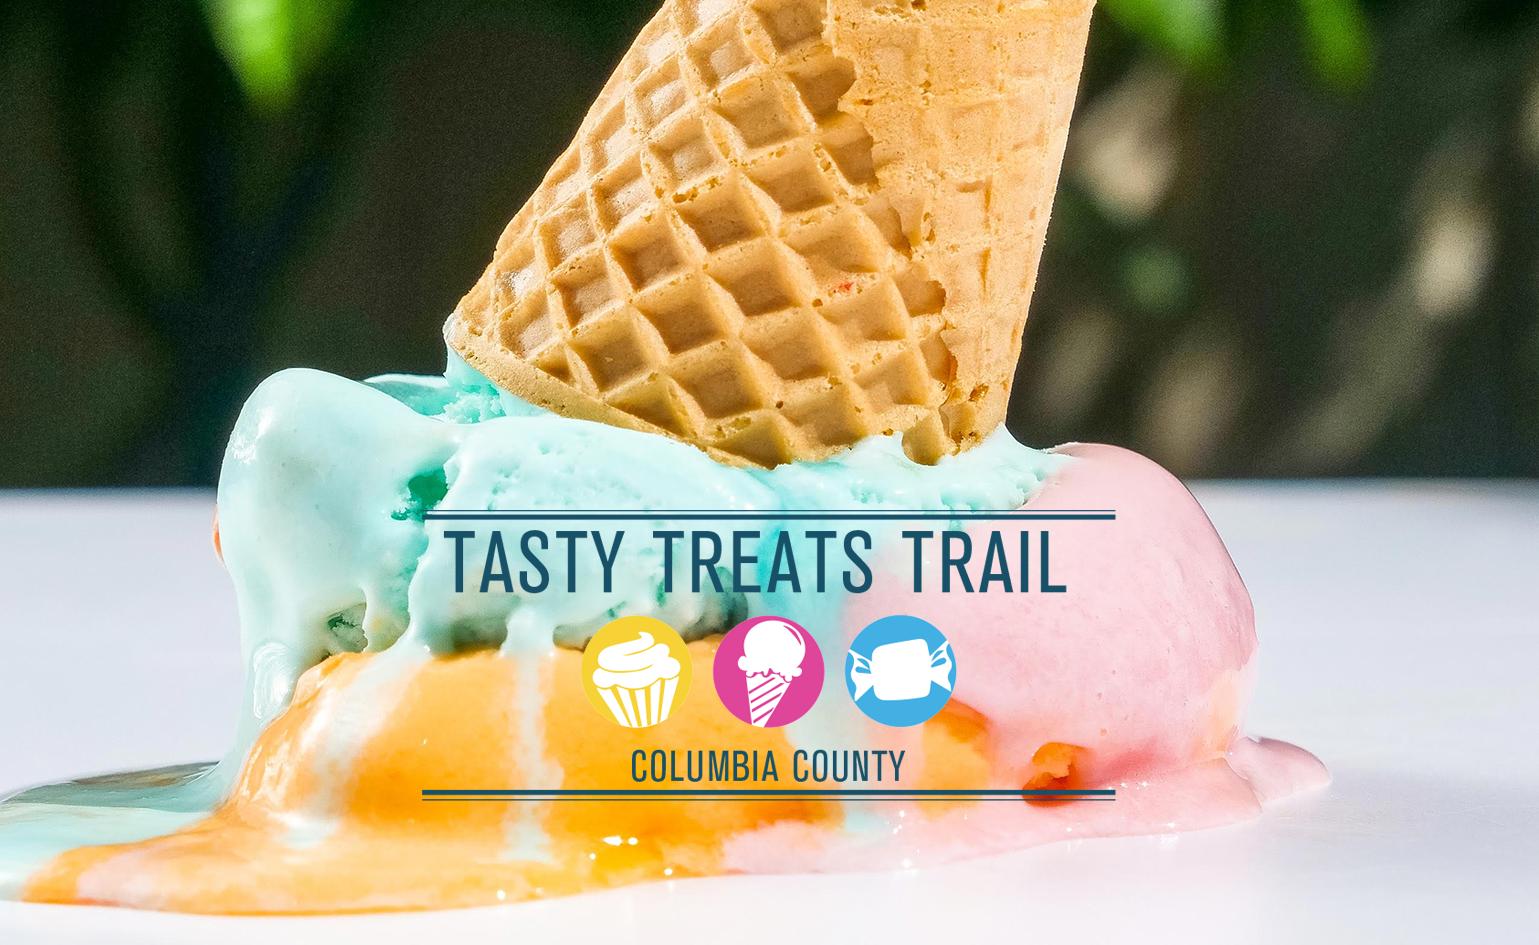 Tasty Treats Trail